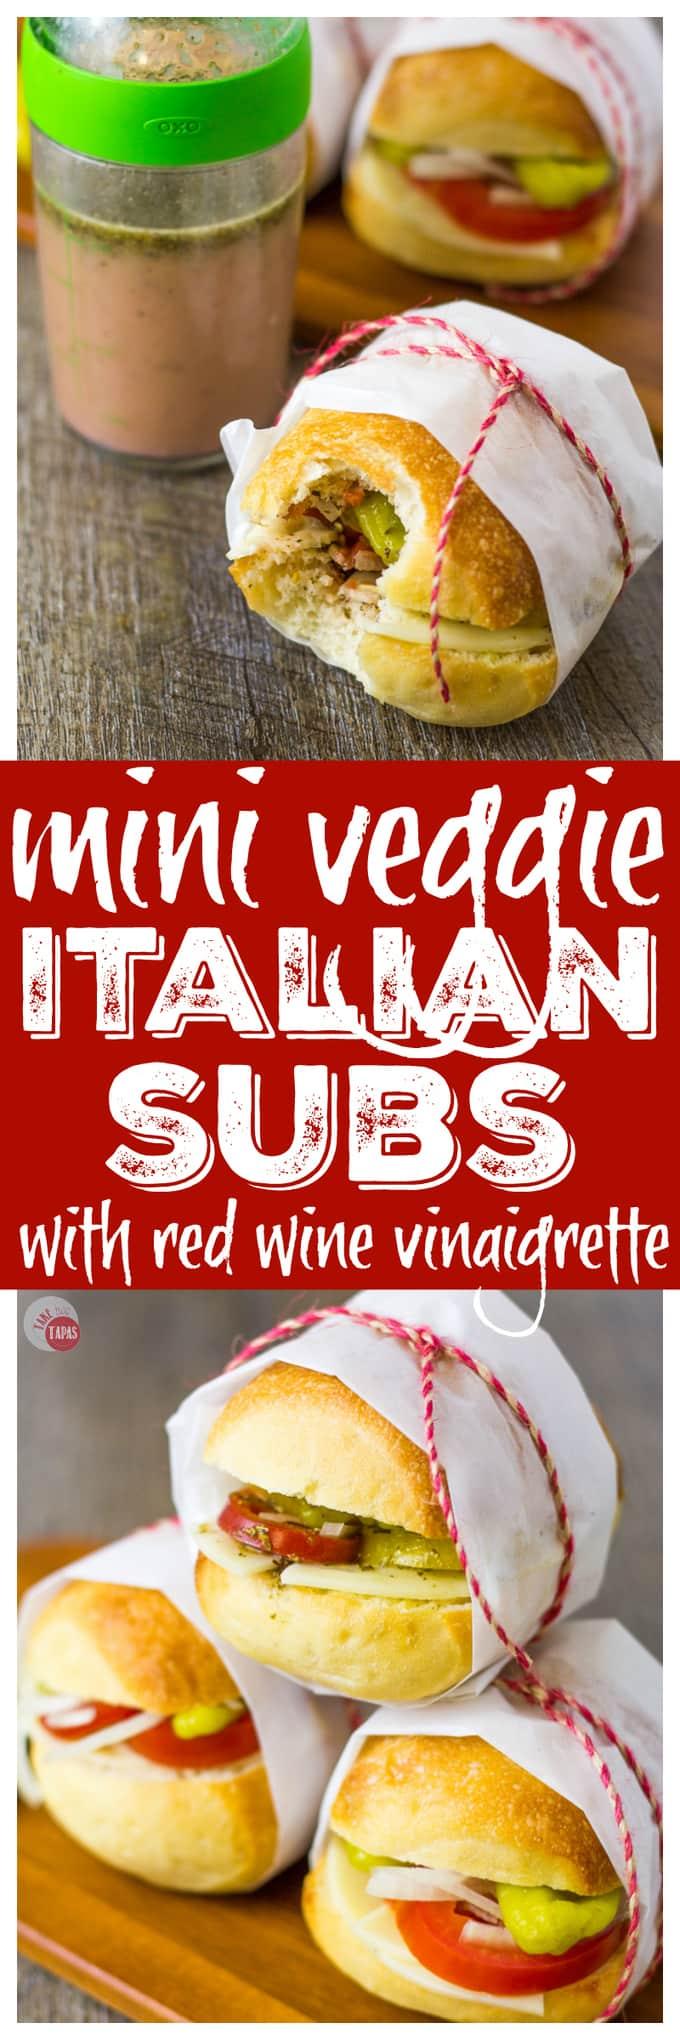 Bob's Mini Veggie Italian Sliders Subs | Take Two Tapas | #VegetarianSliders #PicnicSandwiches #PicnicIdeas #VeggieSandwiches #VegetarianSubs